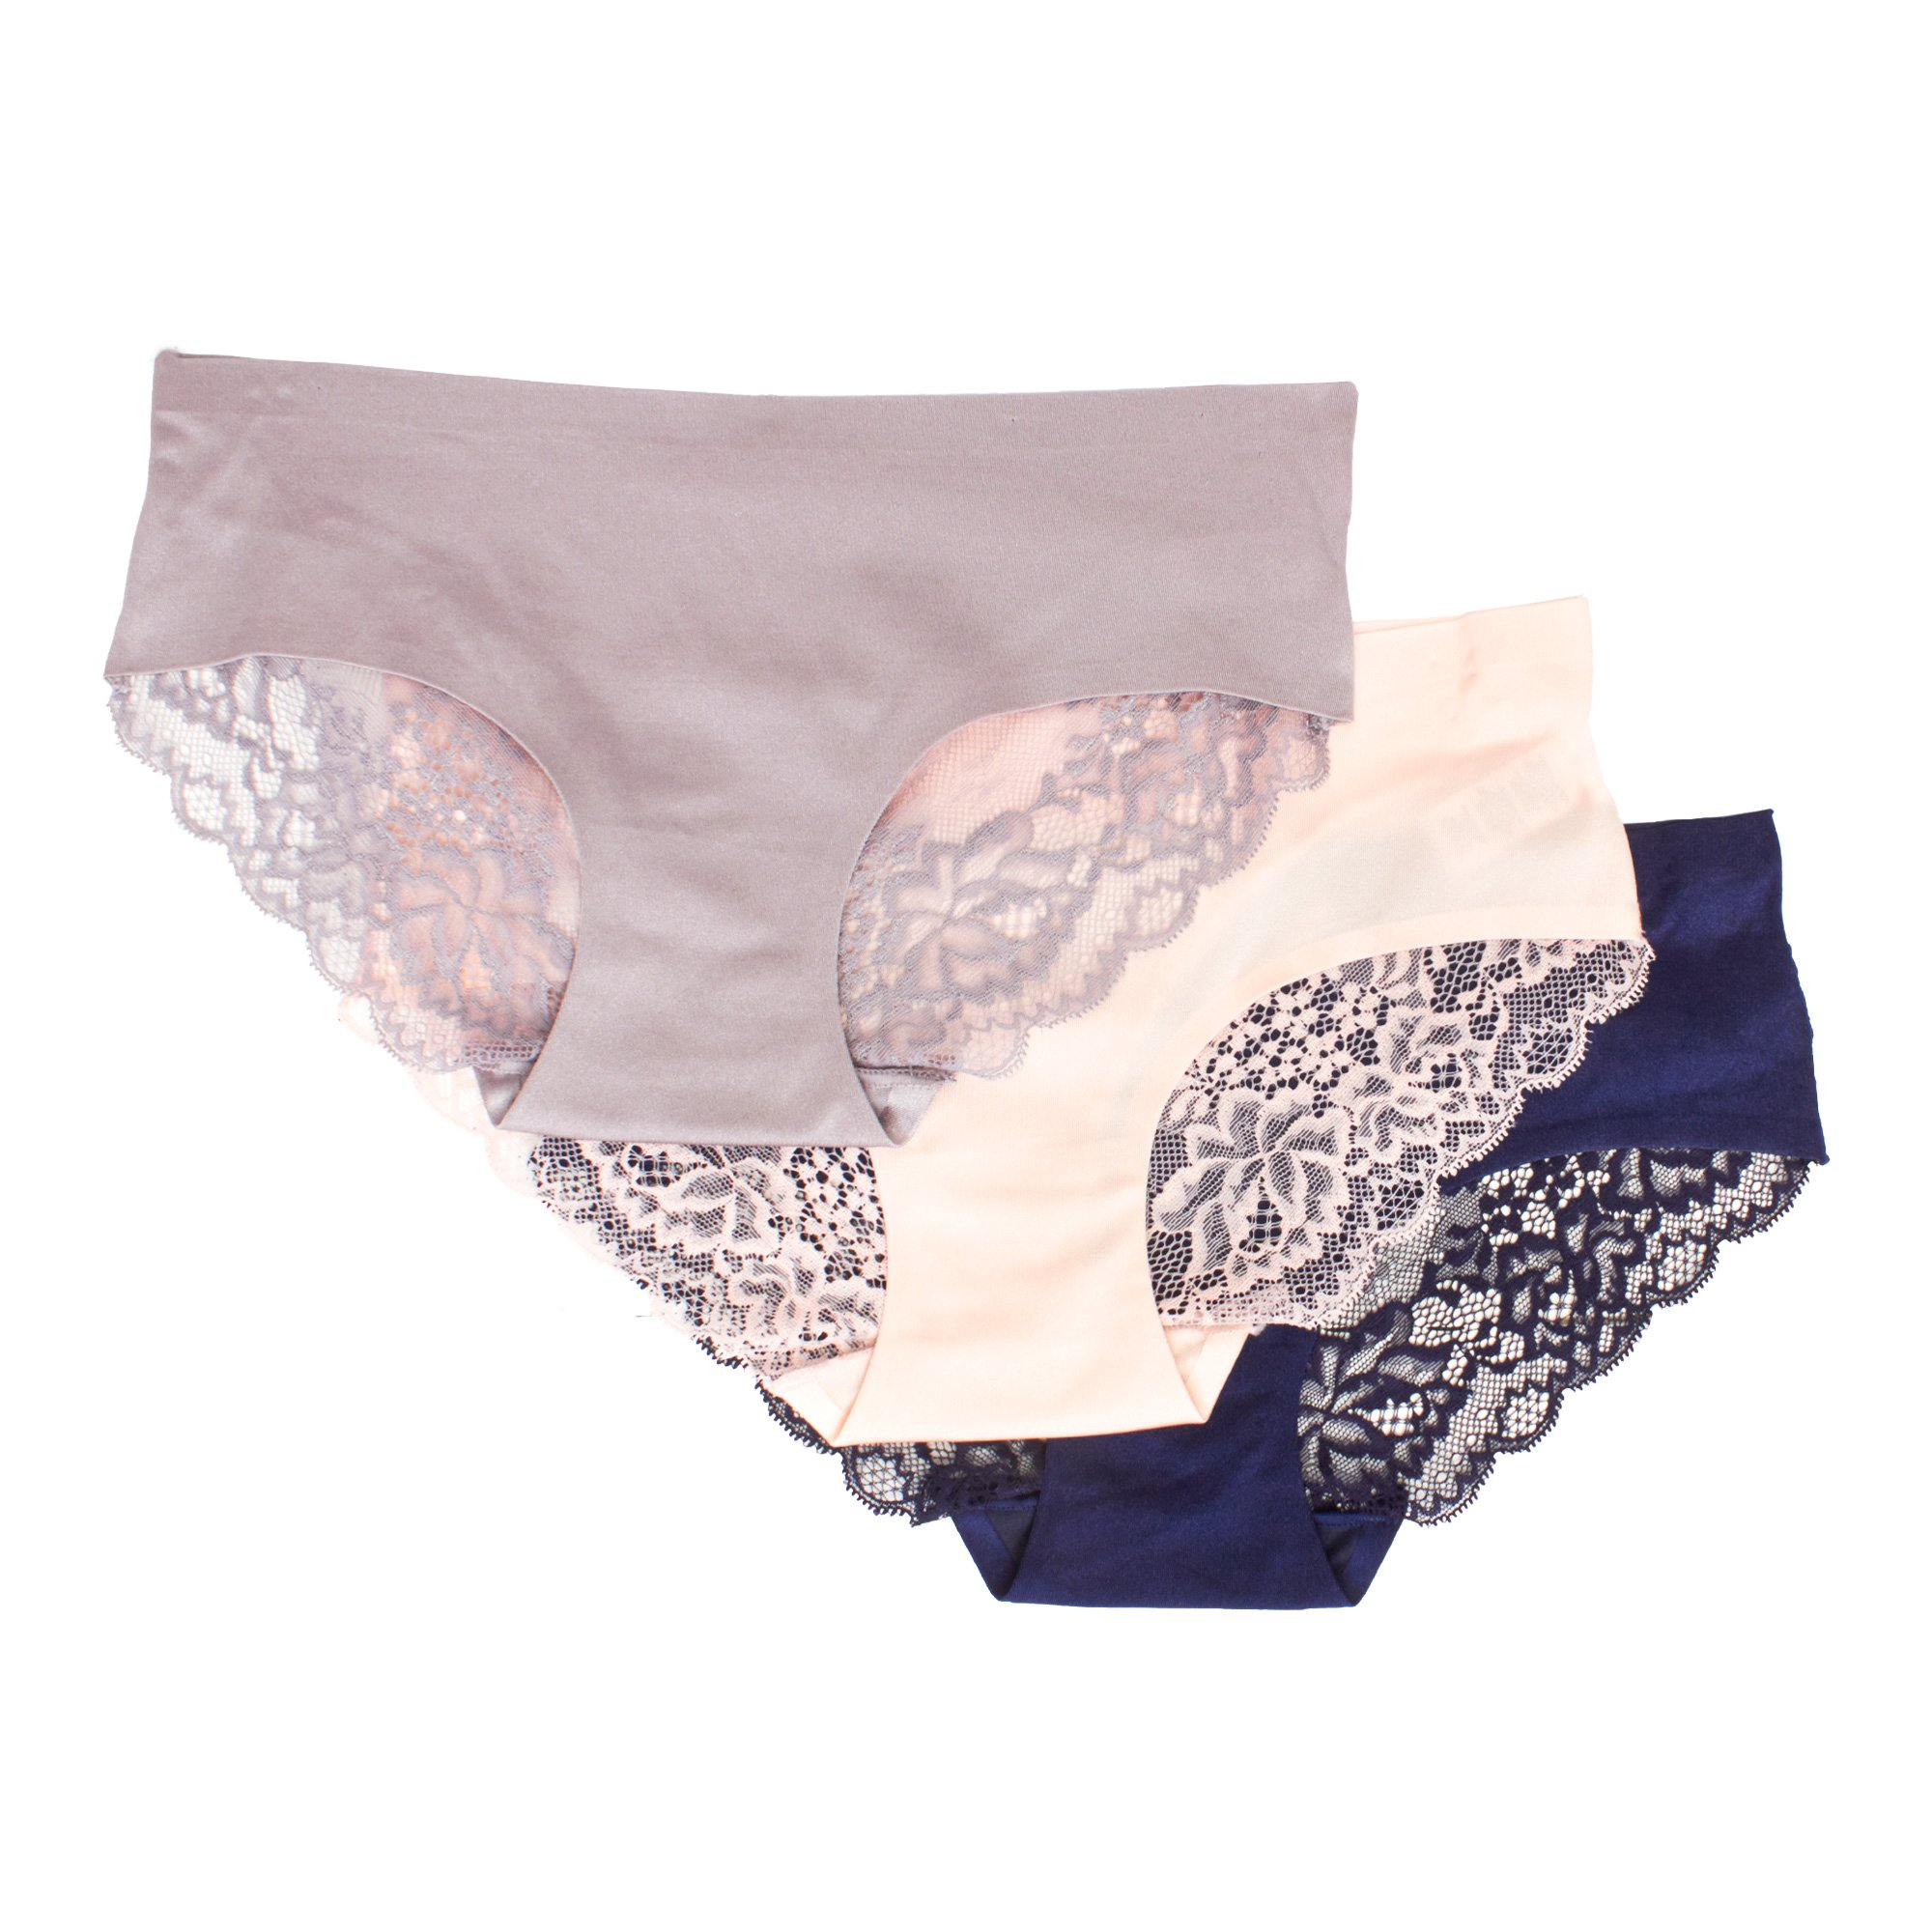 kathy ireland Womens Multi Pack Elastic Waist Boyshort Body Shape Panties